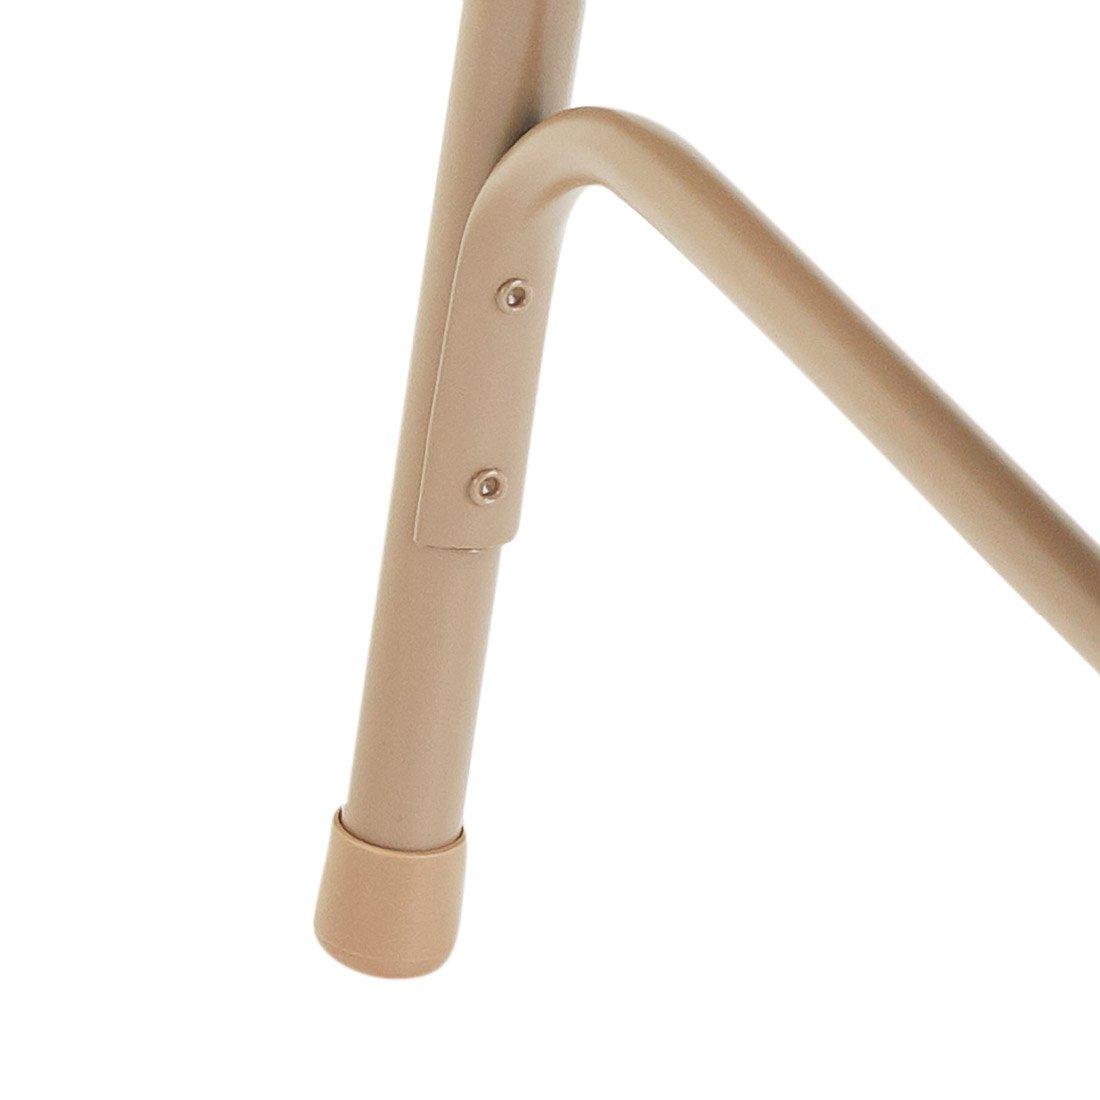 Amazon.com: Sillas plegables de tela premium, de National ...